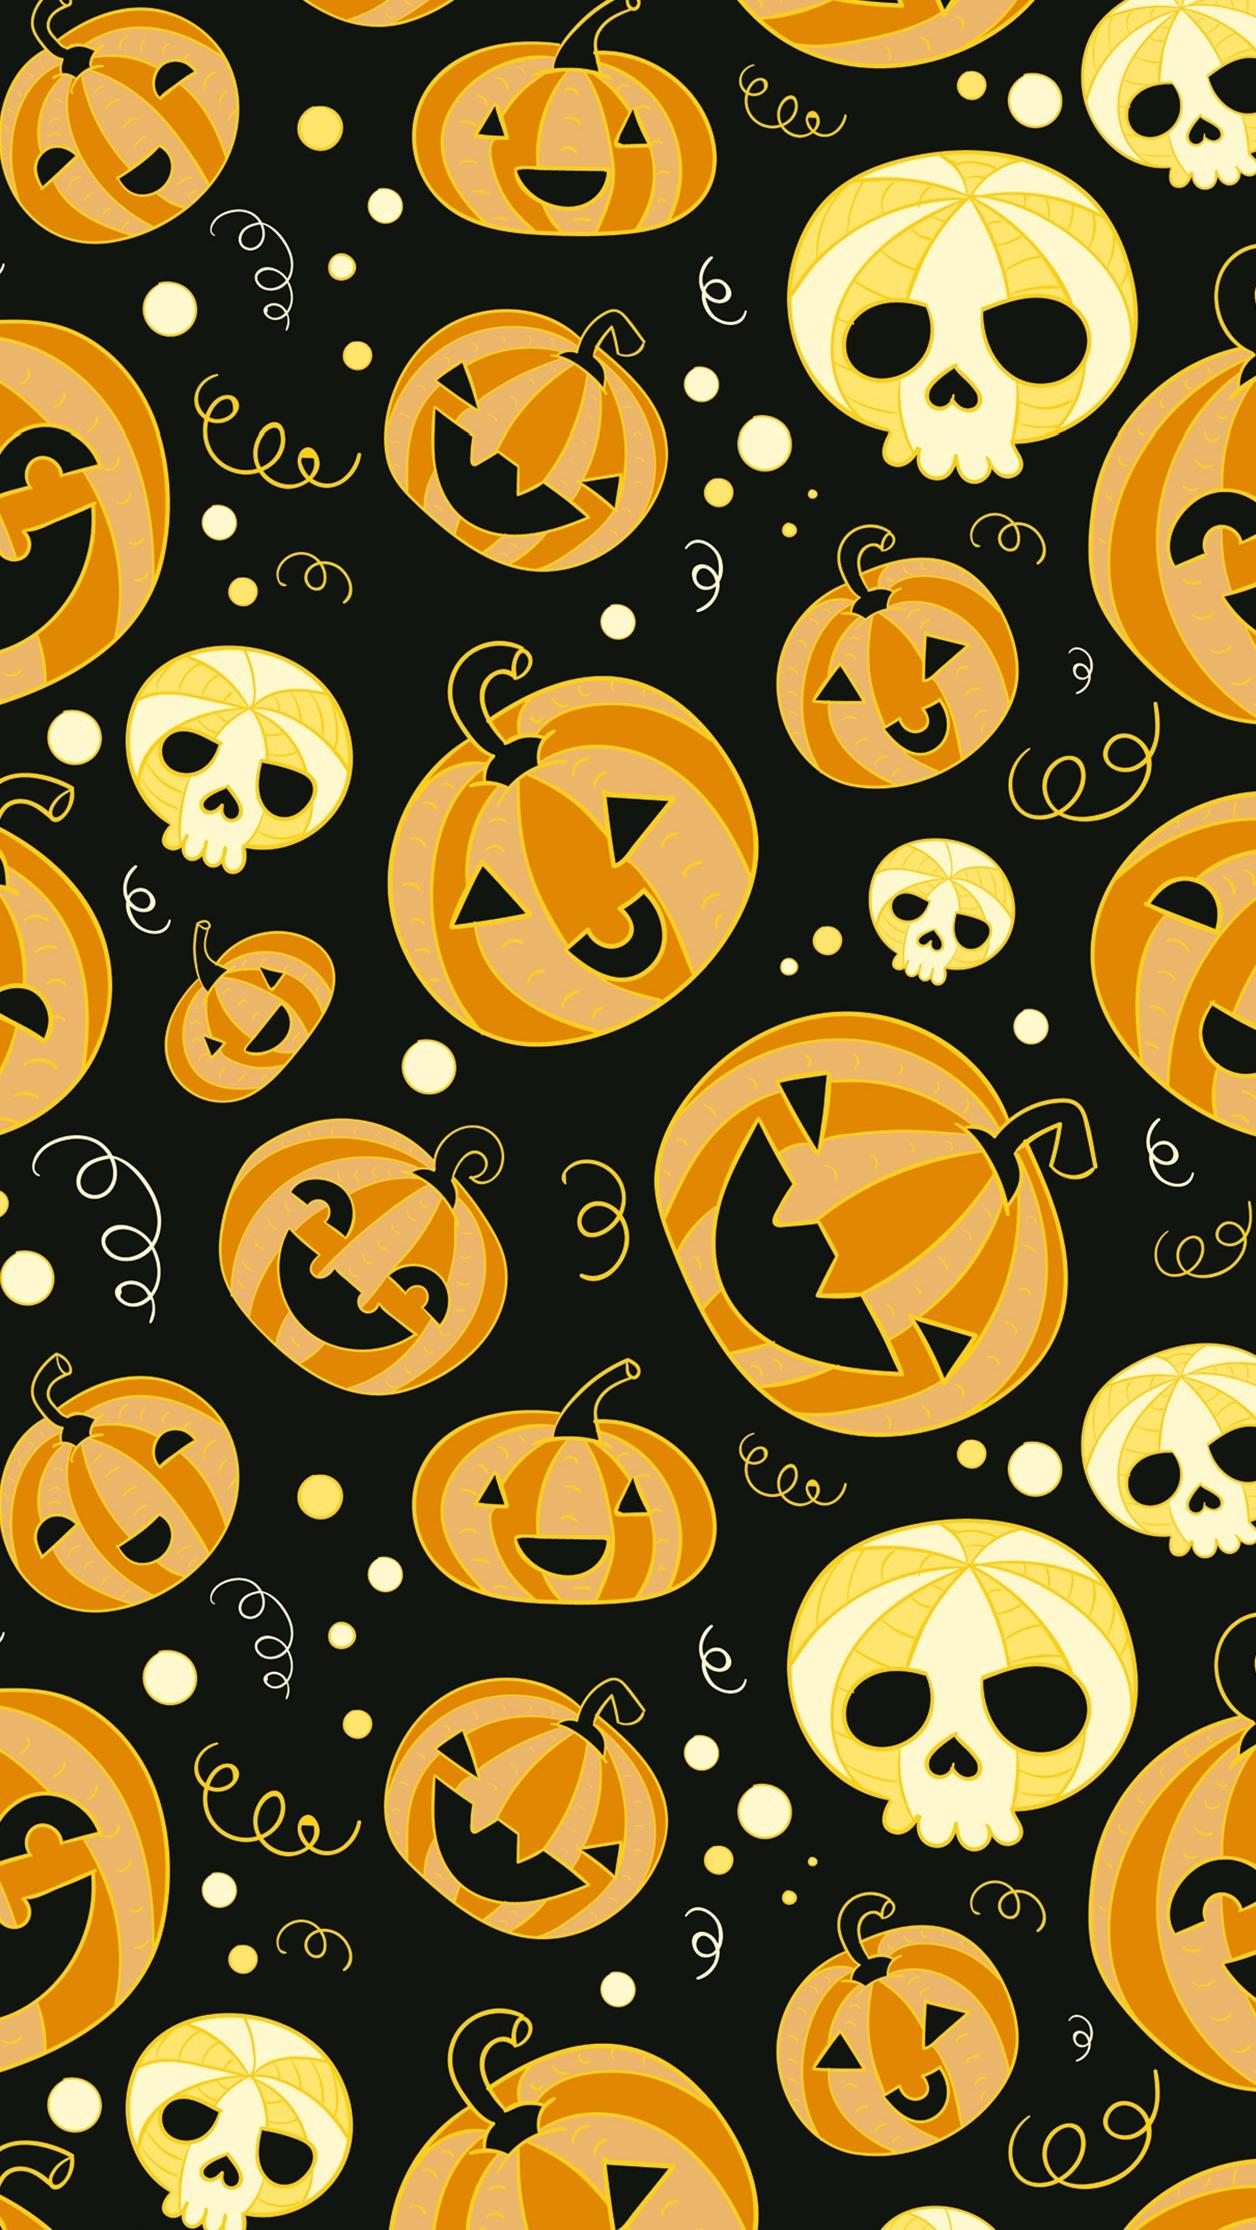 halloweenfunnypumpkinsiphonewallpaper iphone wallpapers